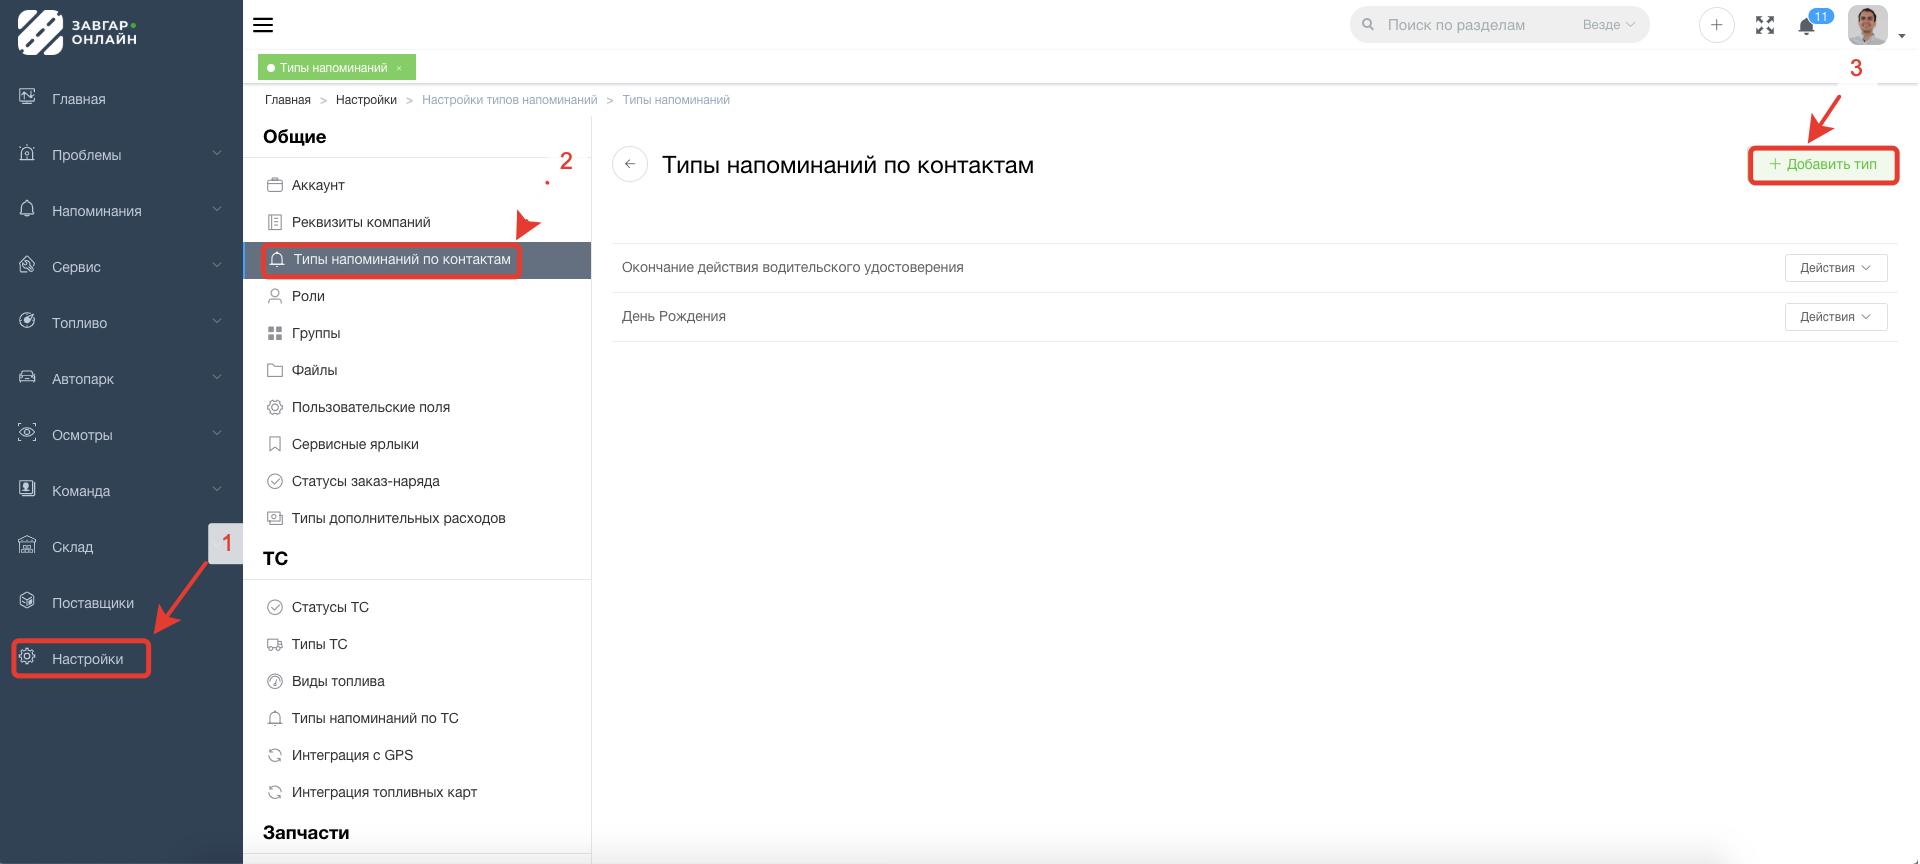 Добавление типа напоминаний по контакту в системе Завгар Онлайн